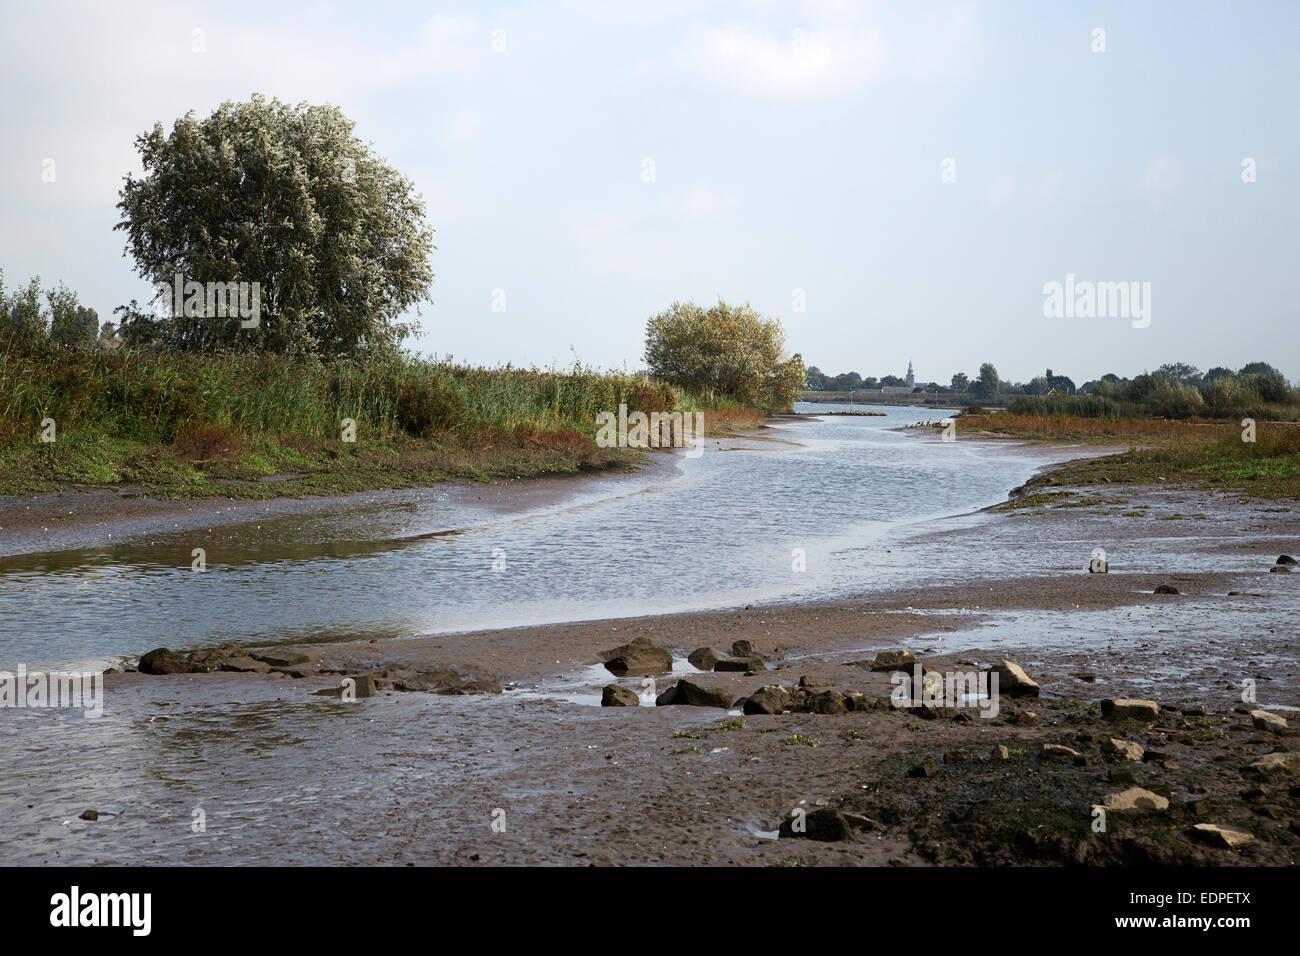 Cove along Dutch river Lek, Nieuw-Lekkerland, South Holland, Netherlands - Stock Image